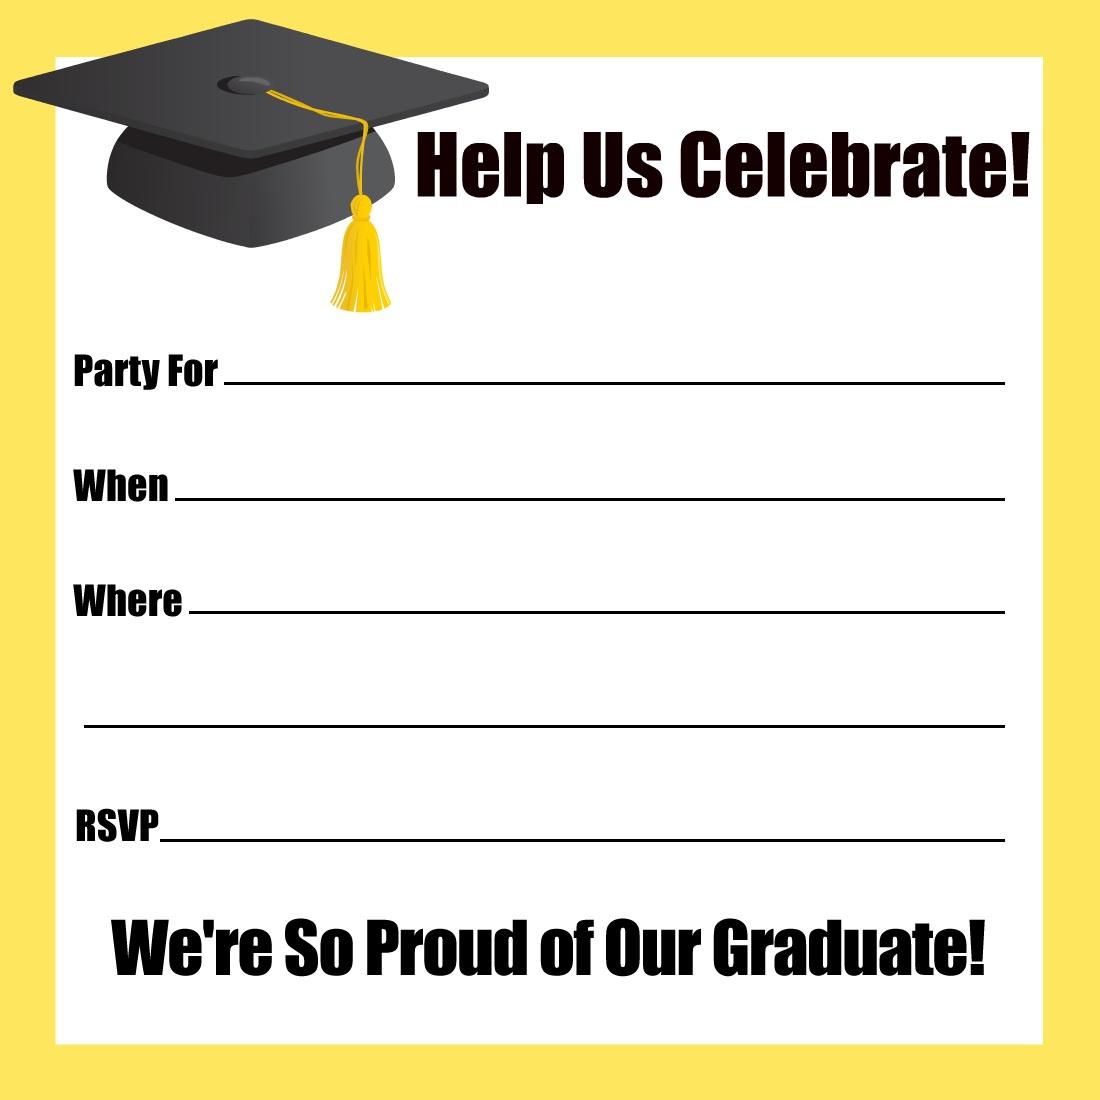 001 Striking Graduation Party Invitation Template Idea  Microsoft Word 4 Per PageFull